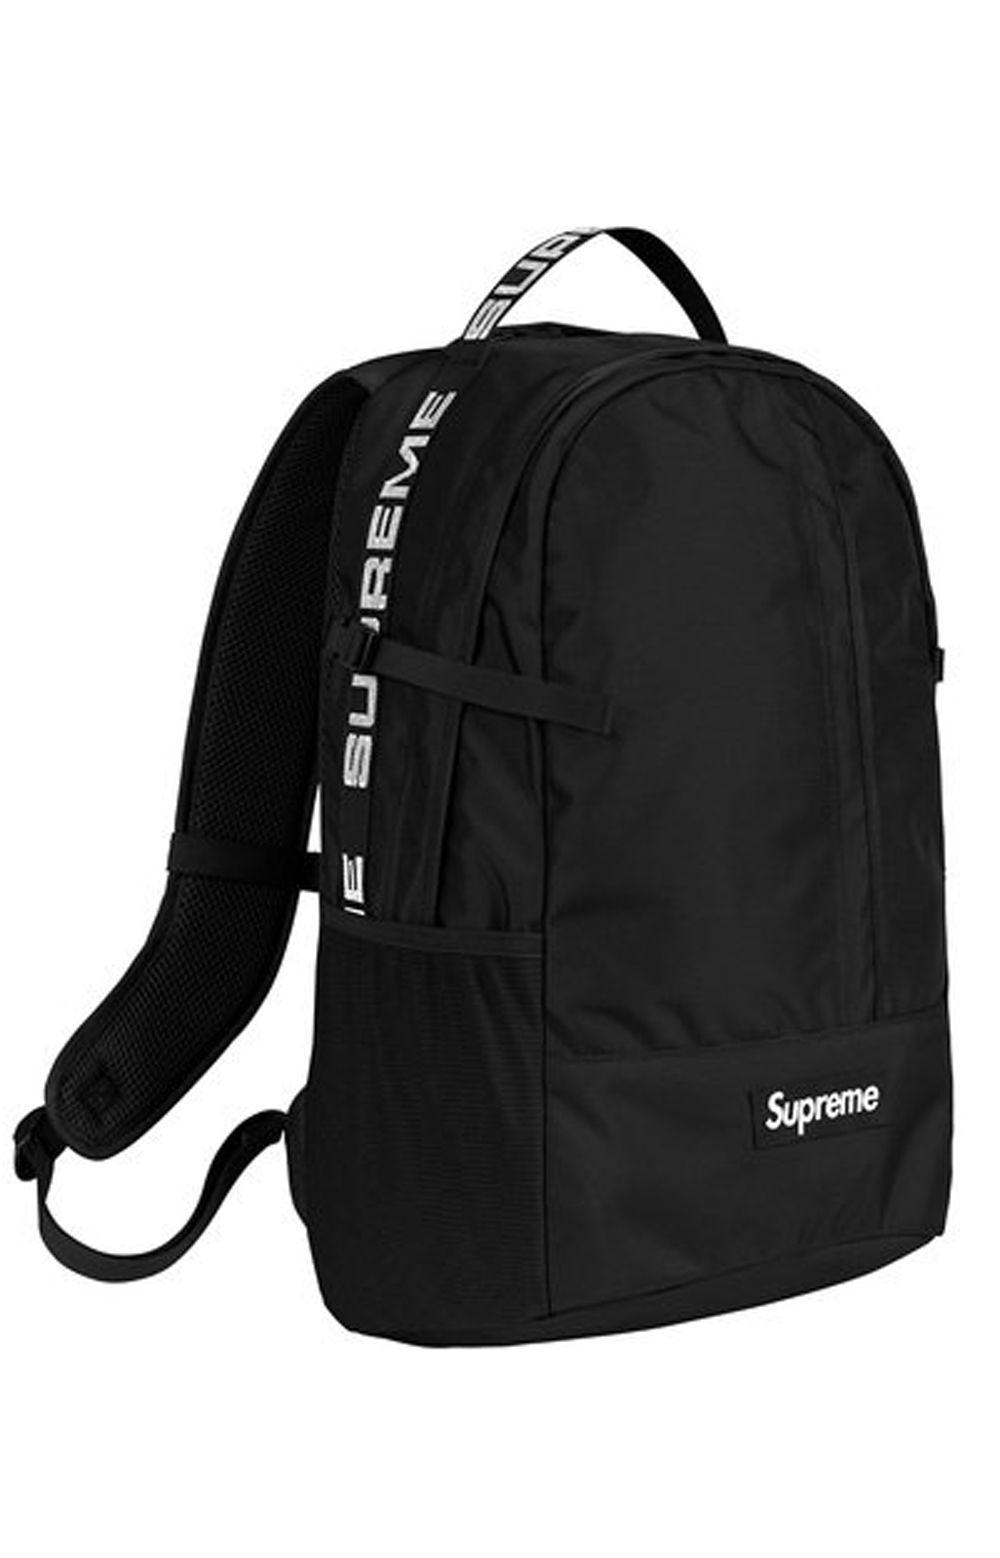 f4805ea0 Thumbnail 1 Supreme Backpack, Bape, Shoe Dazzle, Supreme Accessories, Stony  Brook,